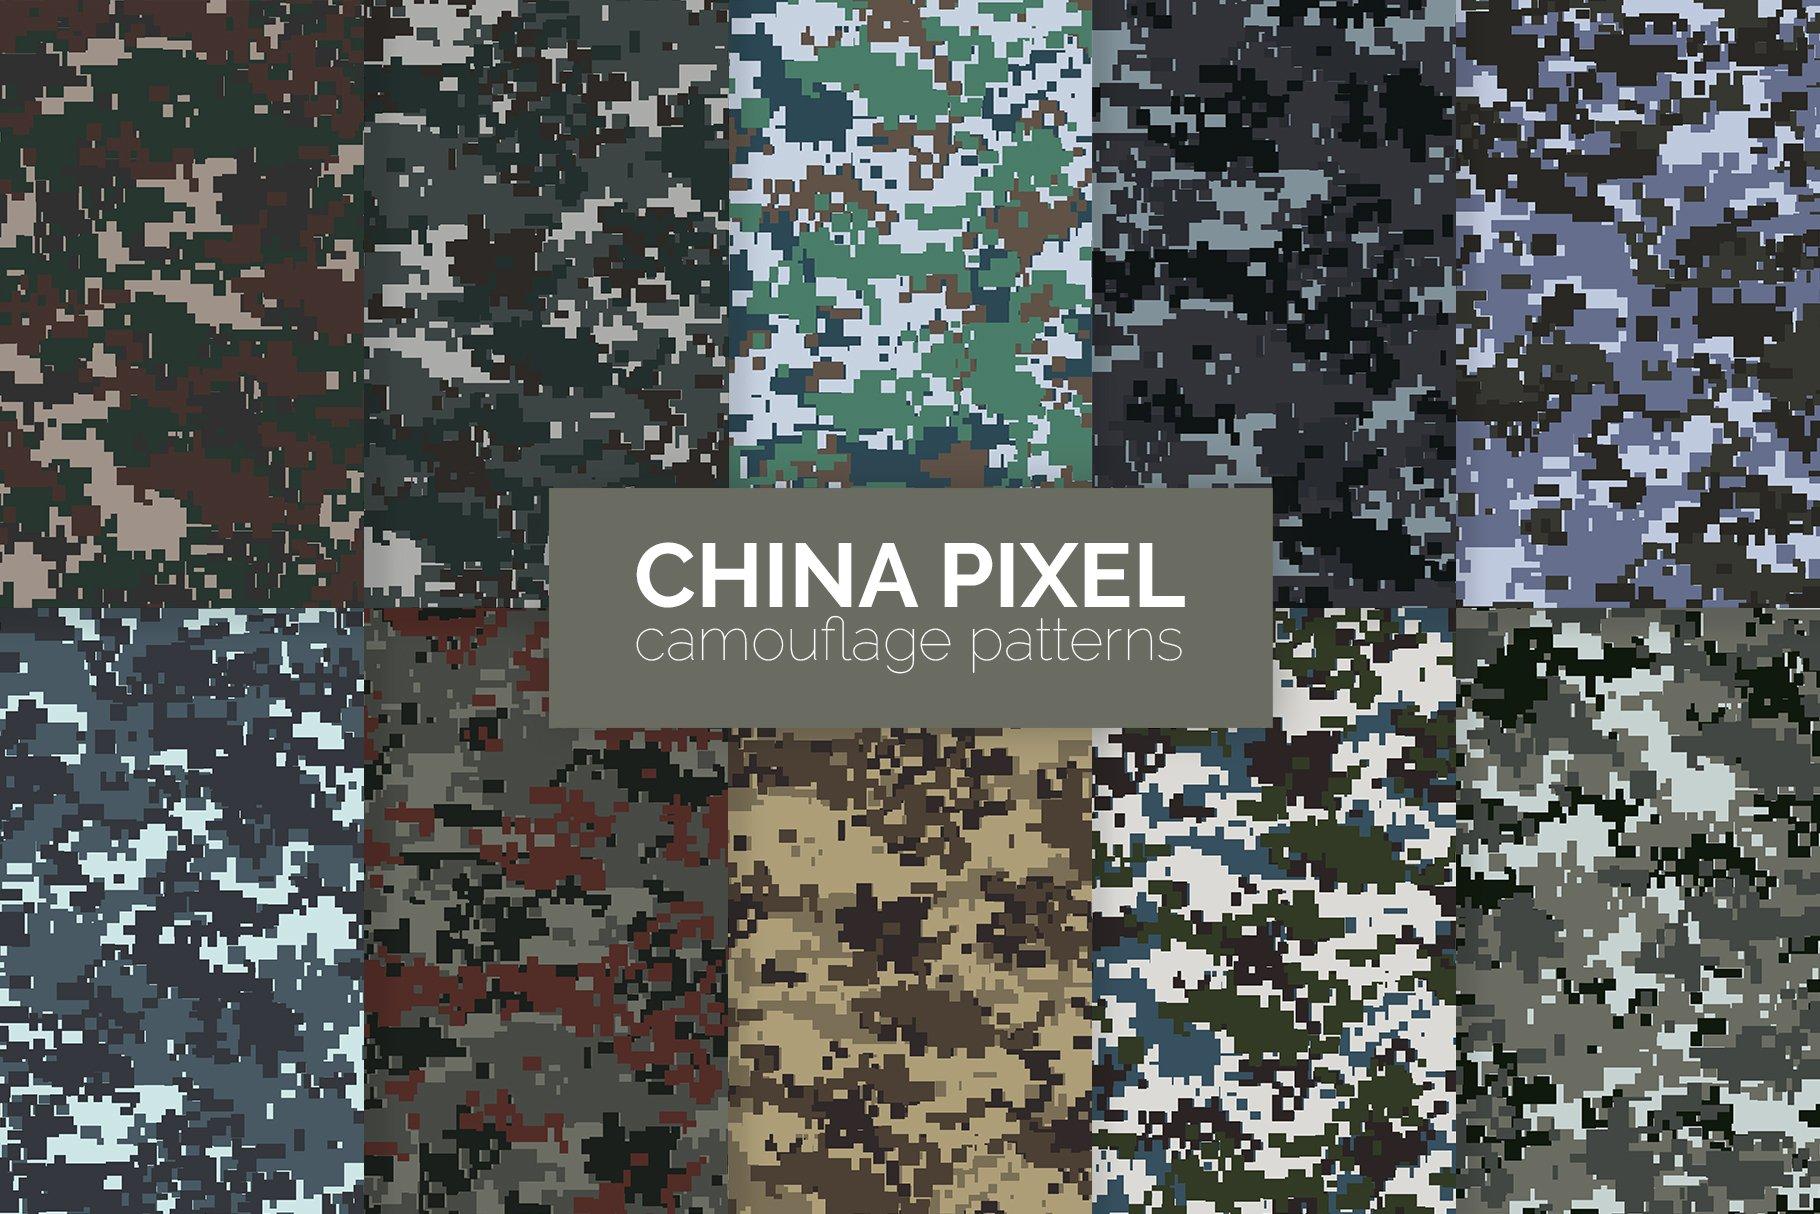 China Pixel Camouflage Patterns example image 1